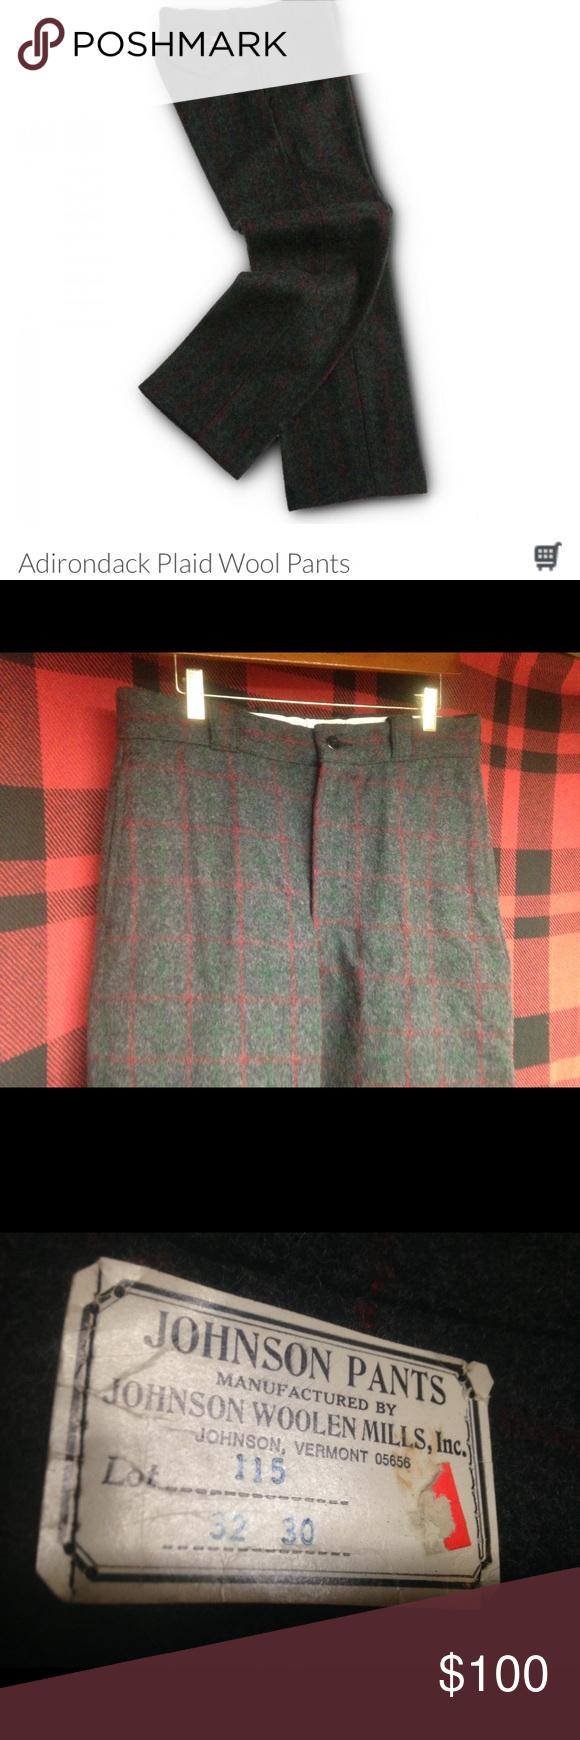 cf200ae7693f1 NWT Johnson woolen mills adirondack plaid pants 32 New with tags Johnson  woolen mills of Vermont